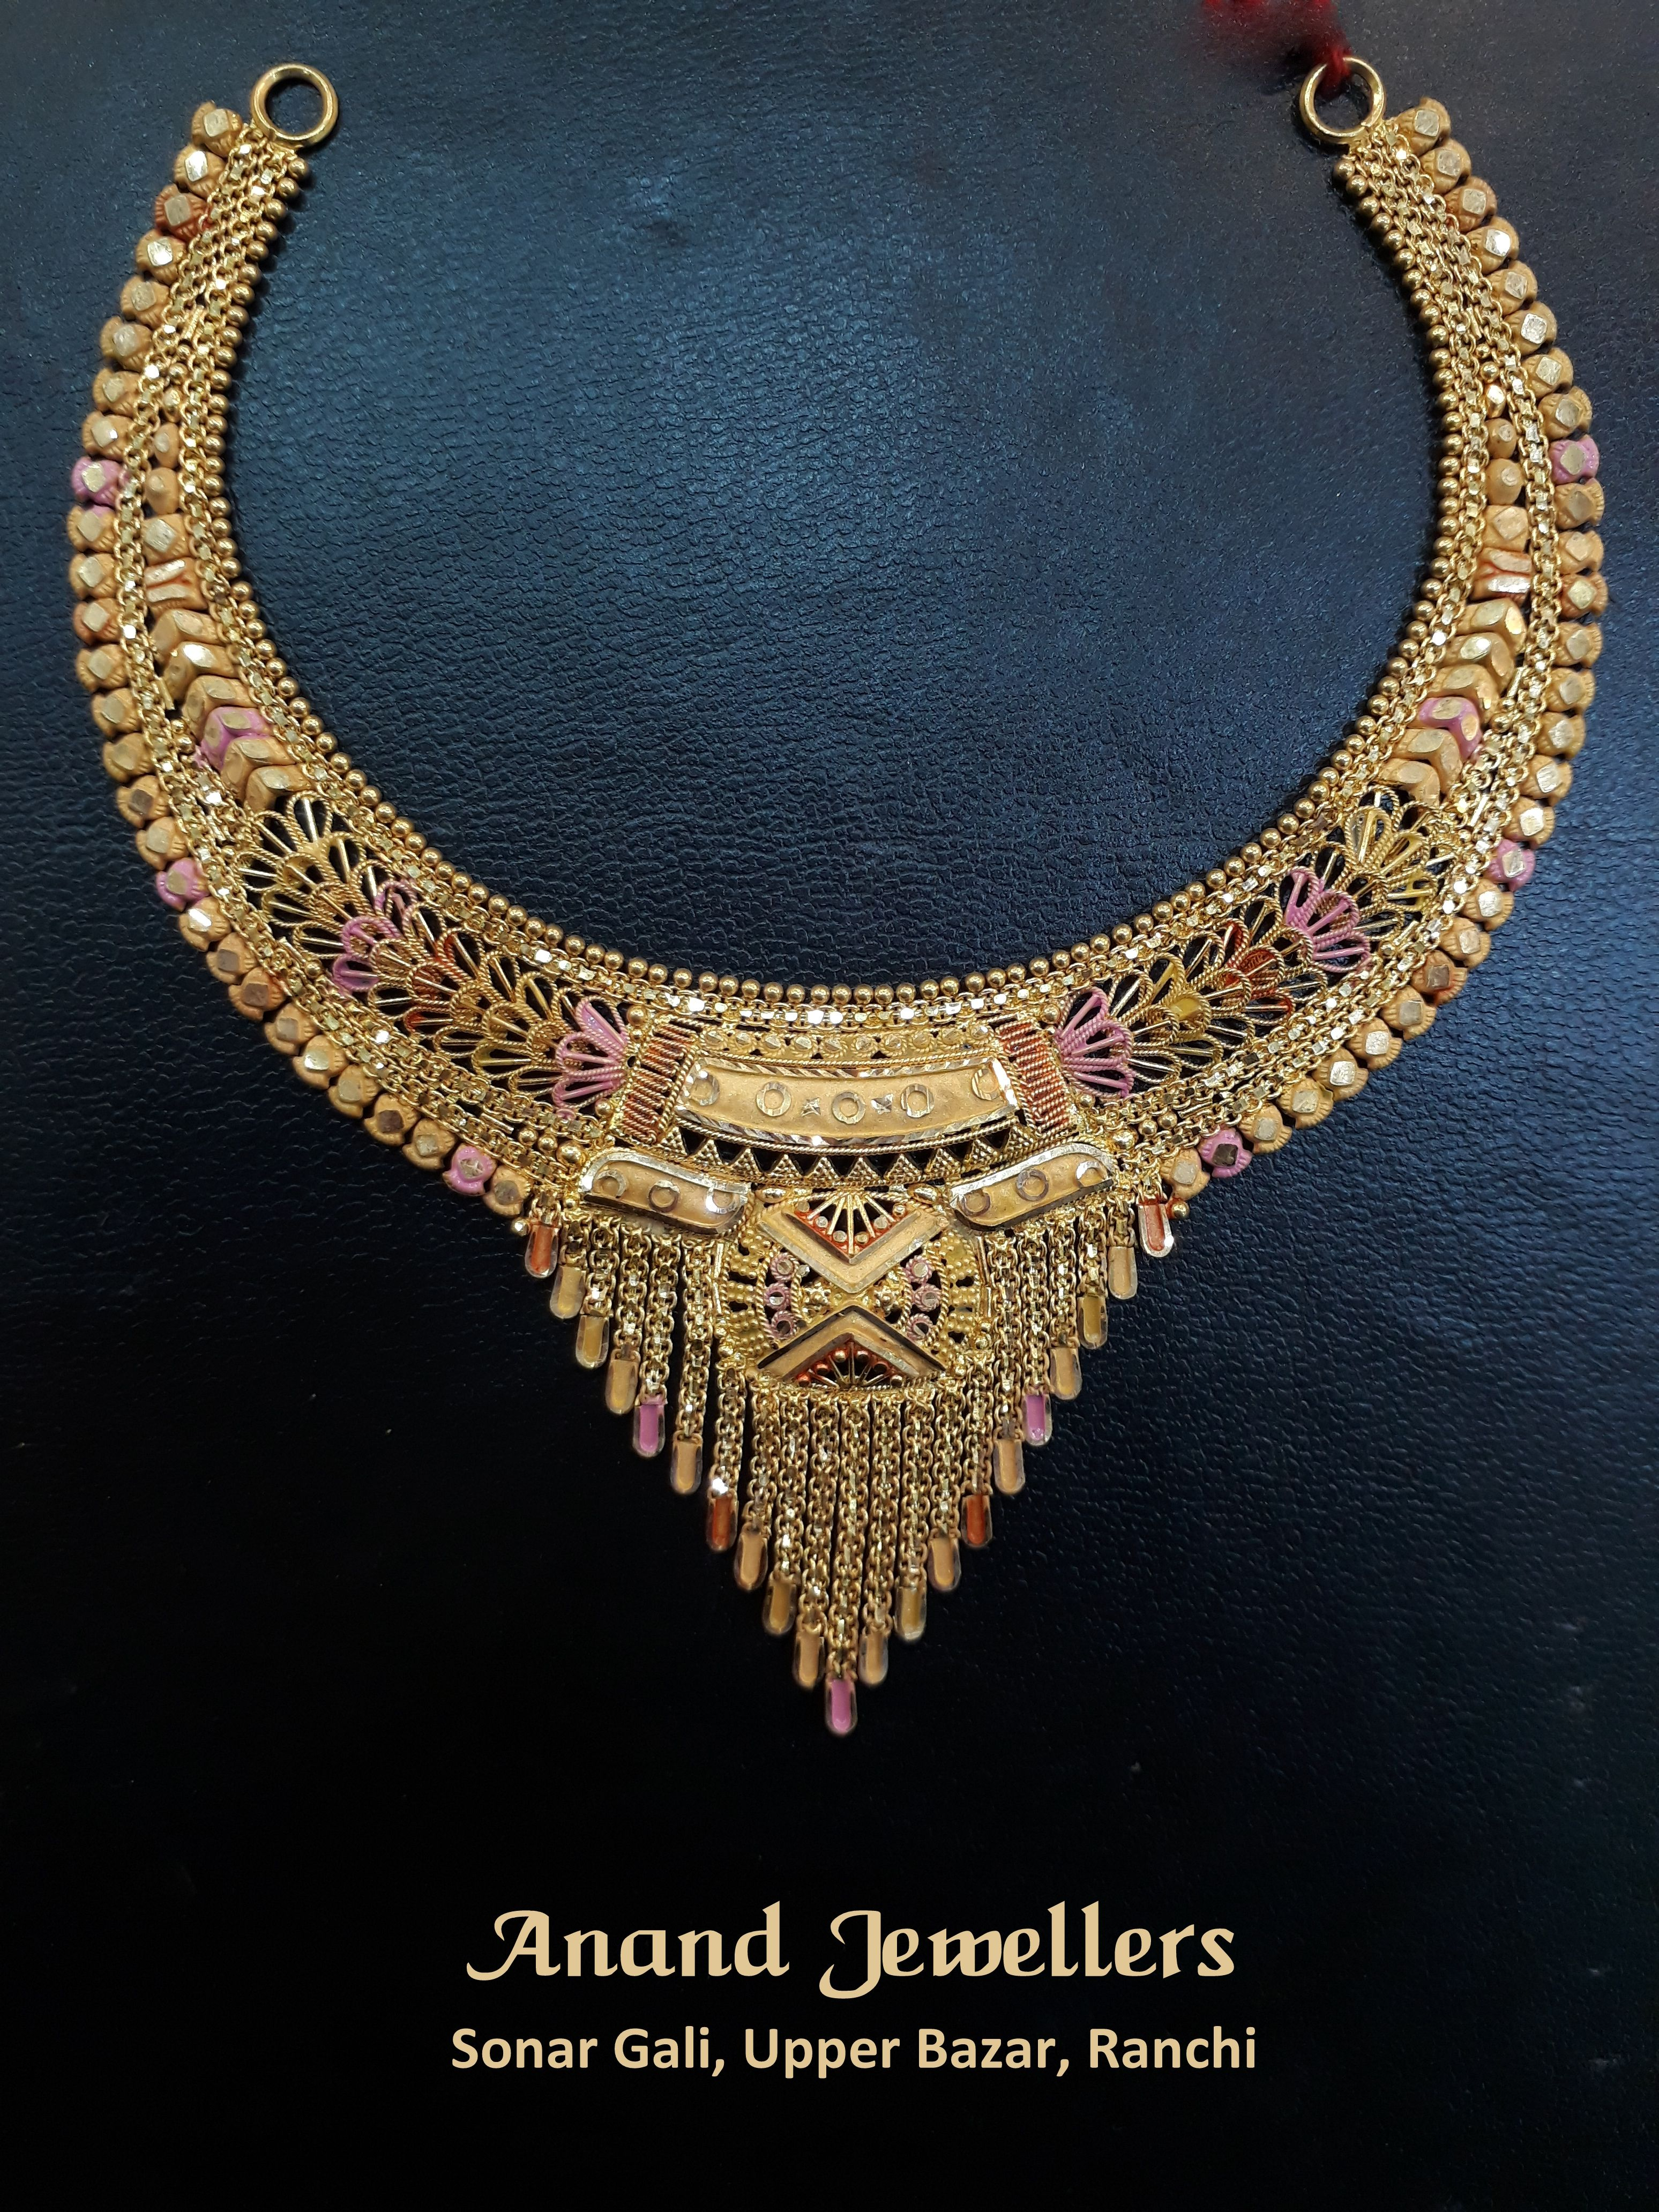 Visit Anand Jewellers at Sonar Gali, Upper Bazar, Ranchi